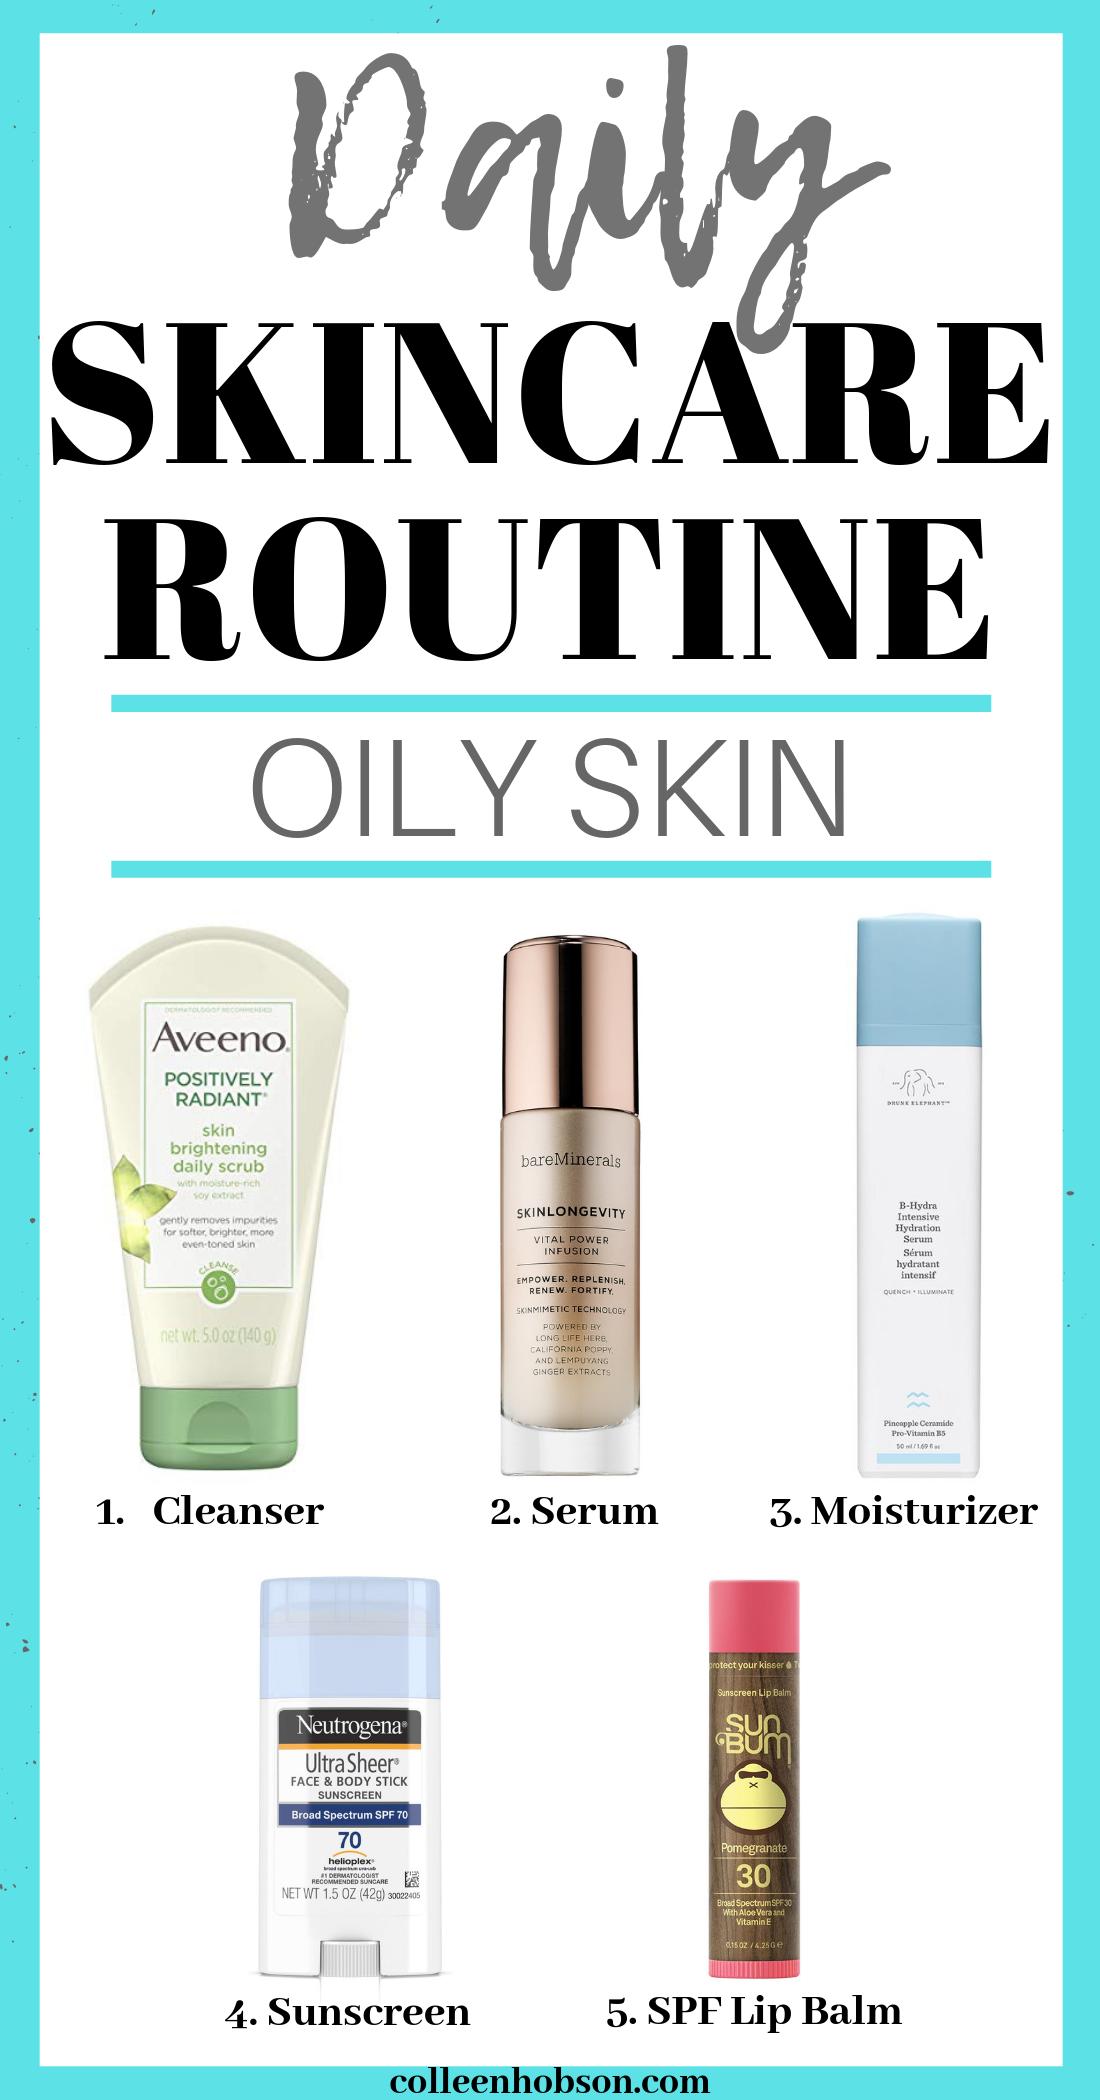 Daily Skincare Routine For Oily Skin Oily skin care